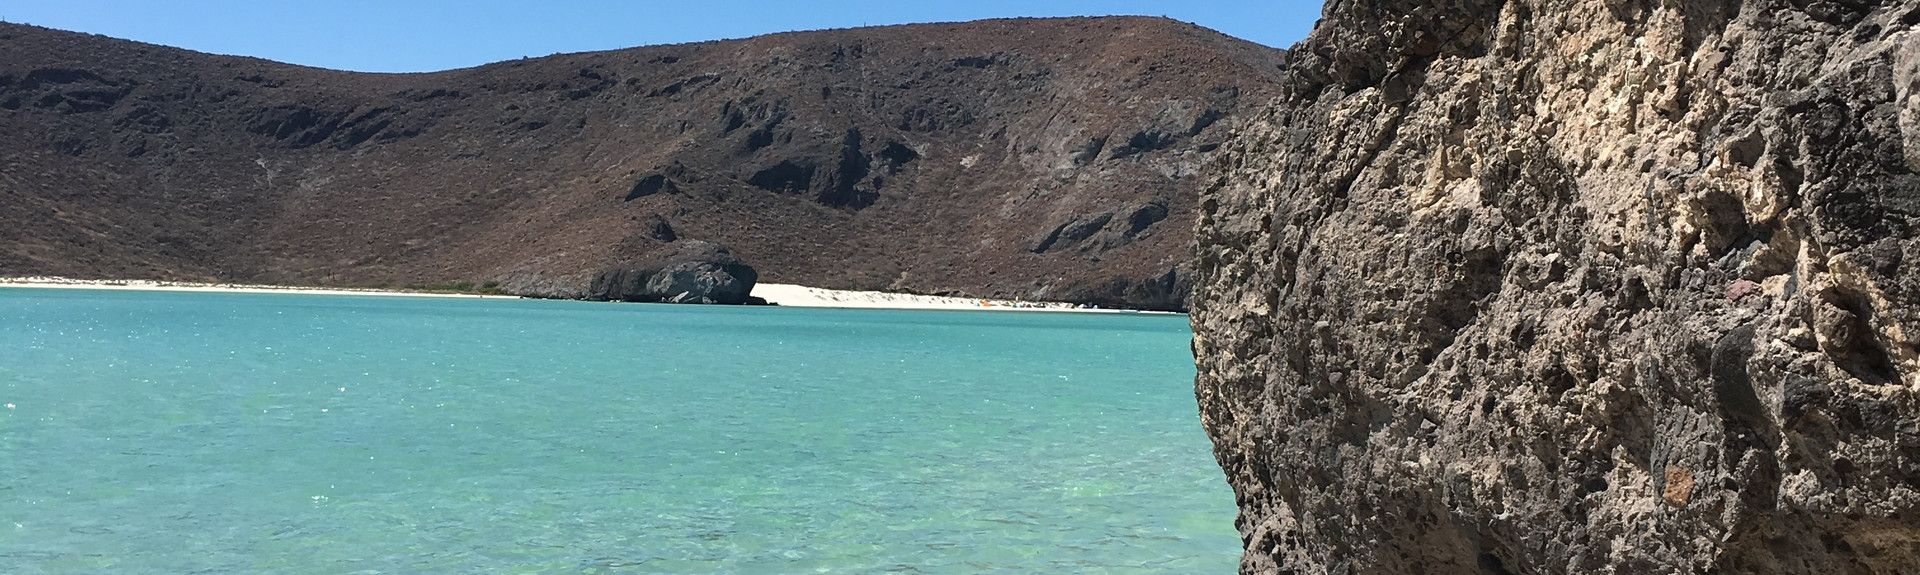 Marina Cortez, La Paz, Baja California Sur, Mexico